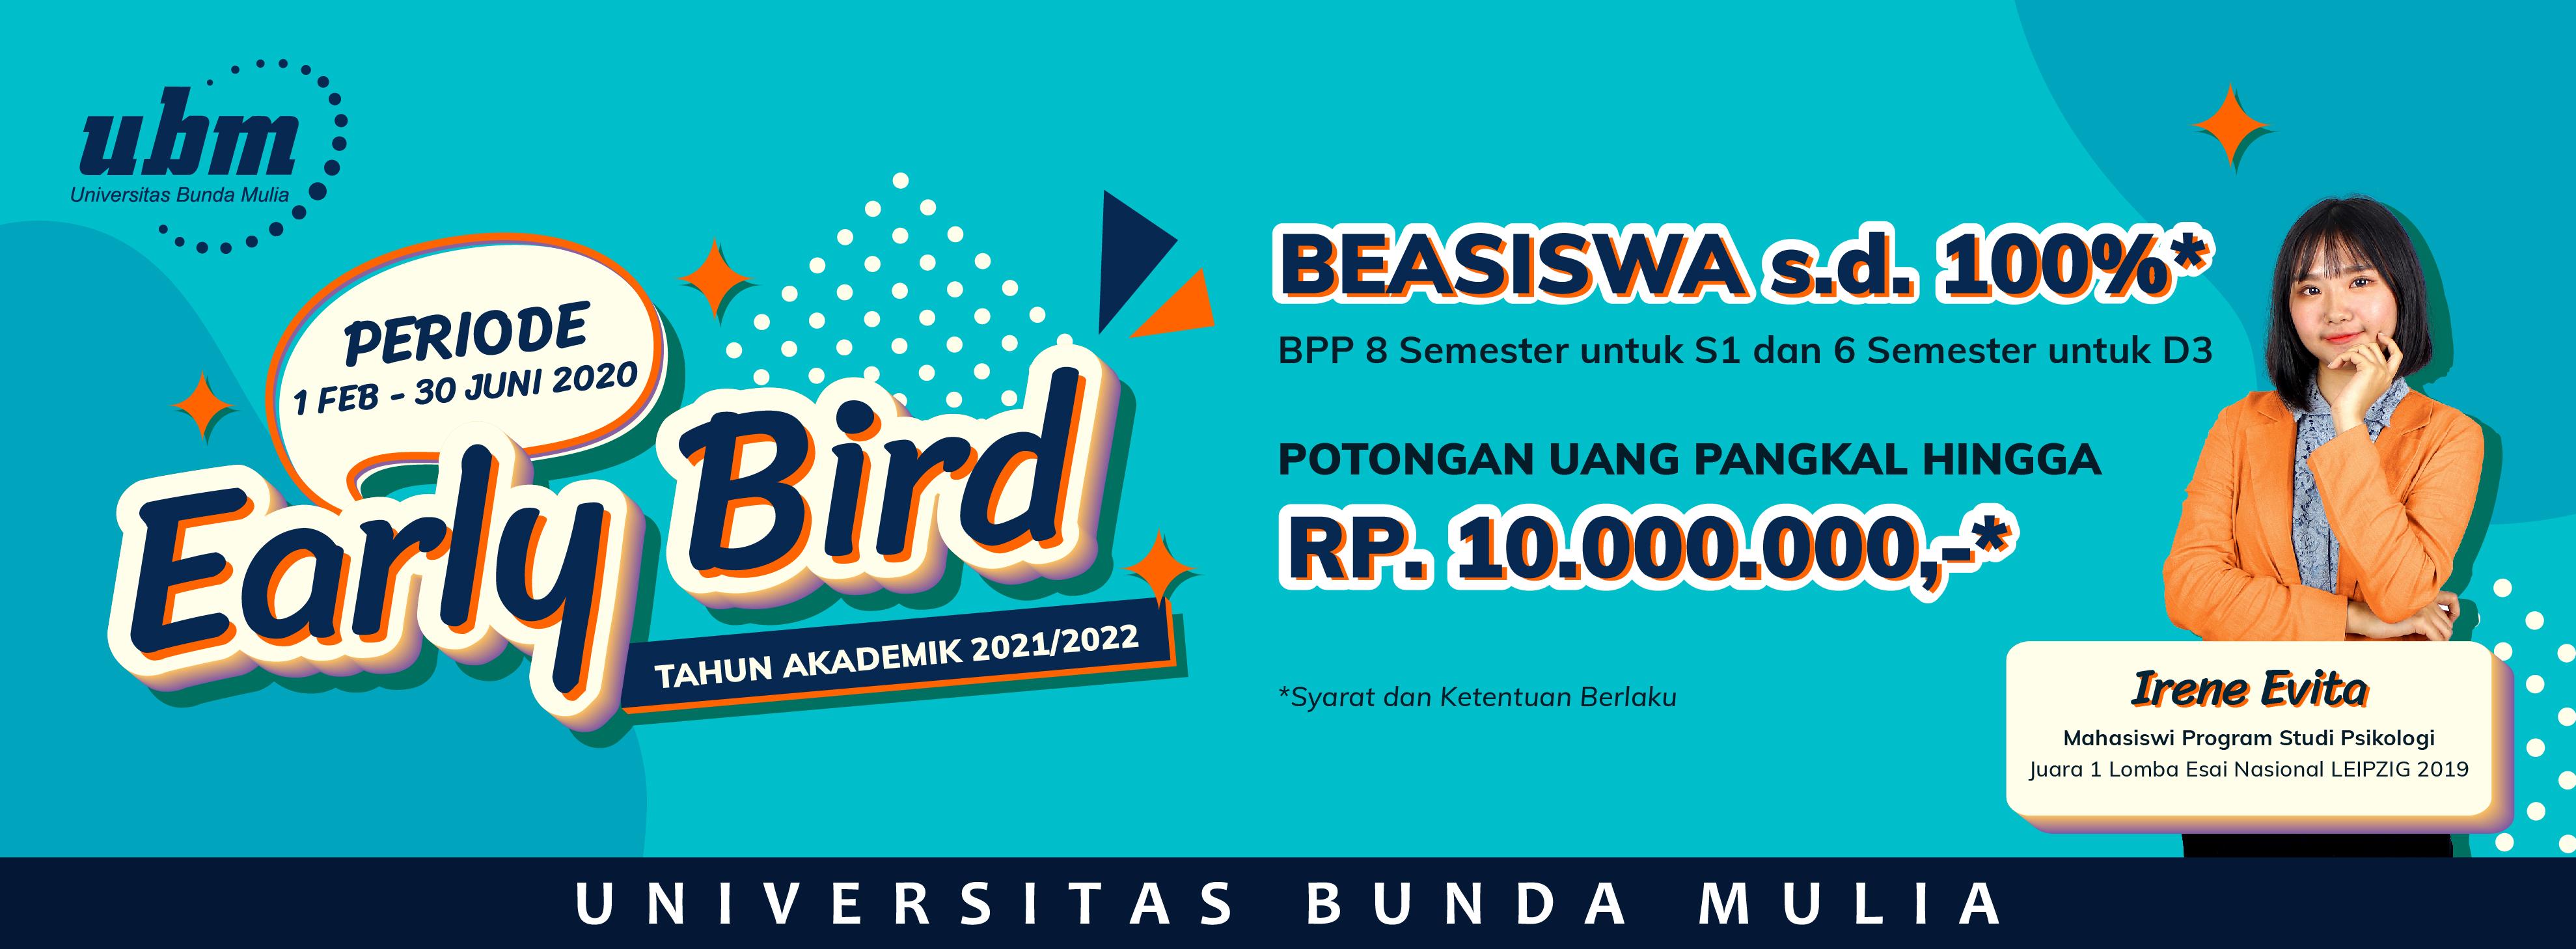 Web-Banner-EB-2021-2022-01